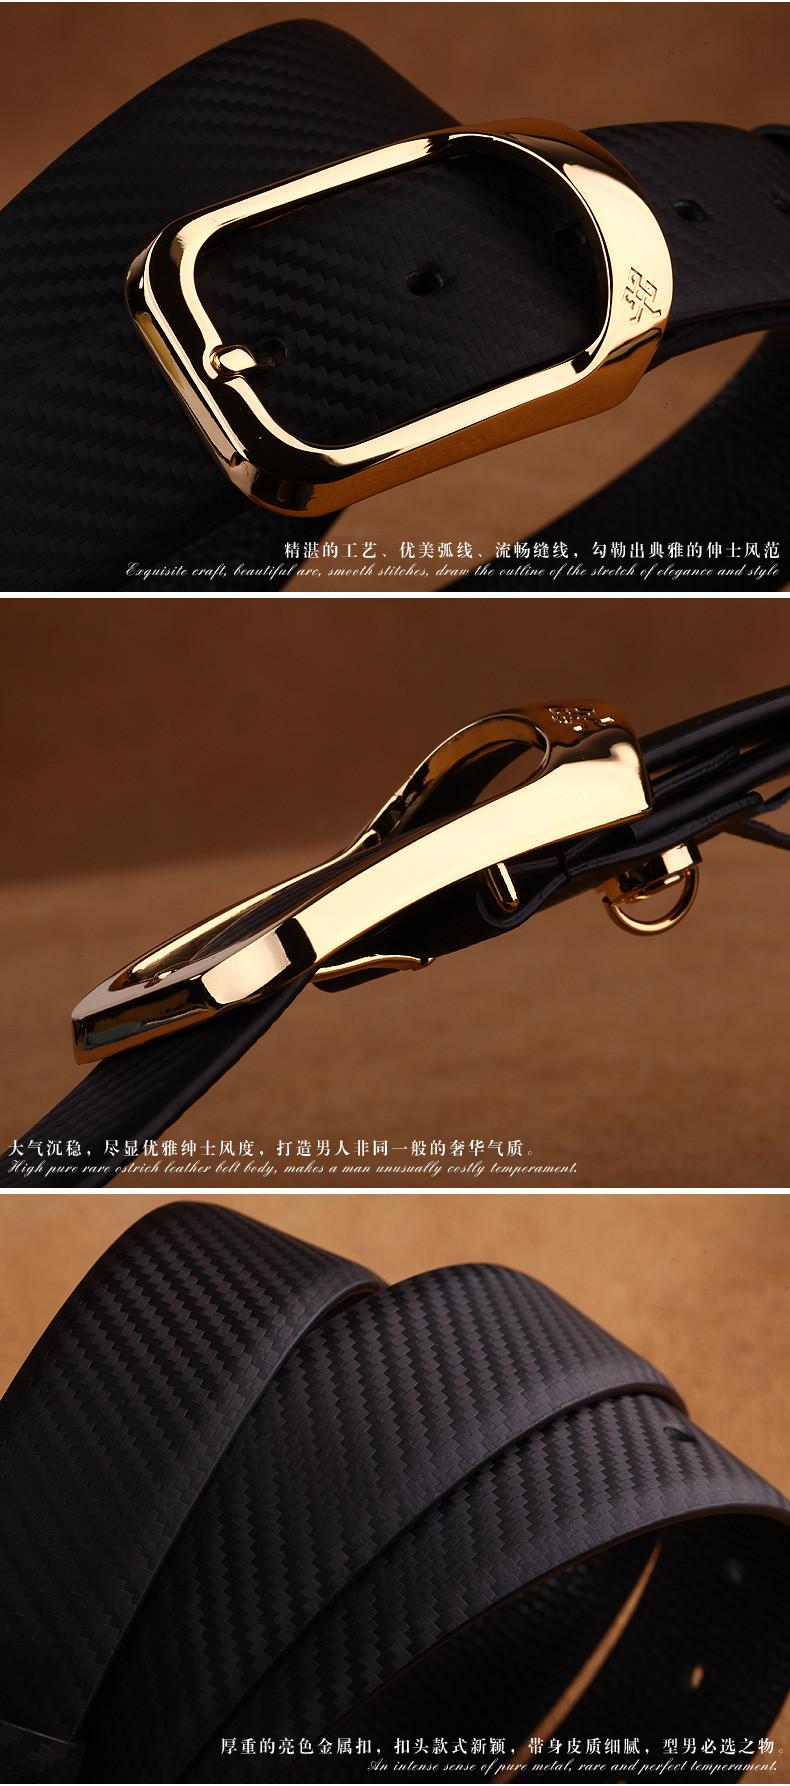 2014 Designer men belts nature cowskin leather Brand Luxury belt High Quality Genuine Leather Belts for Men Male Strap MBP021-4B